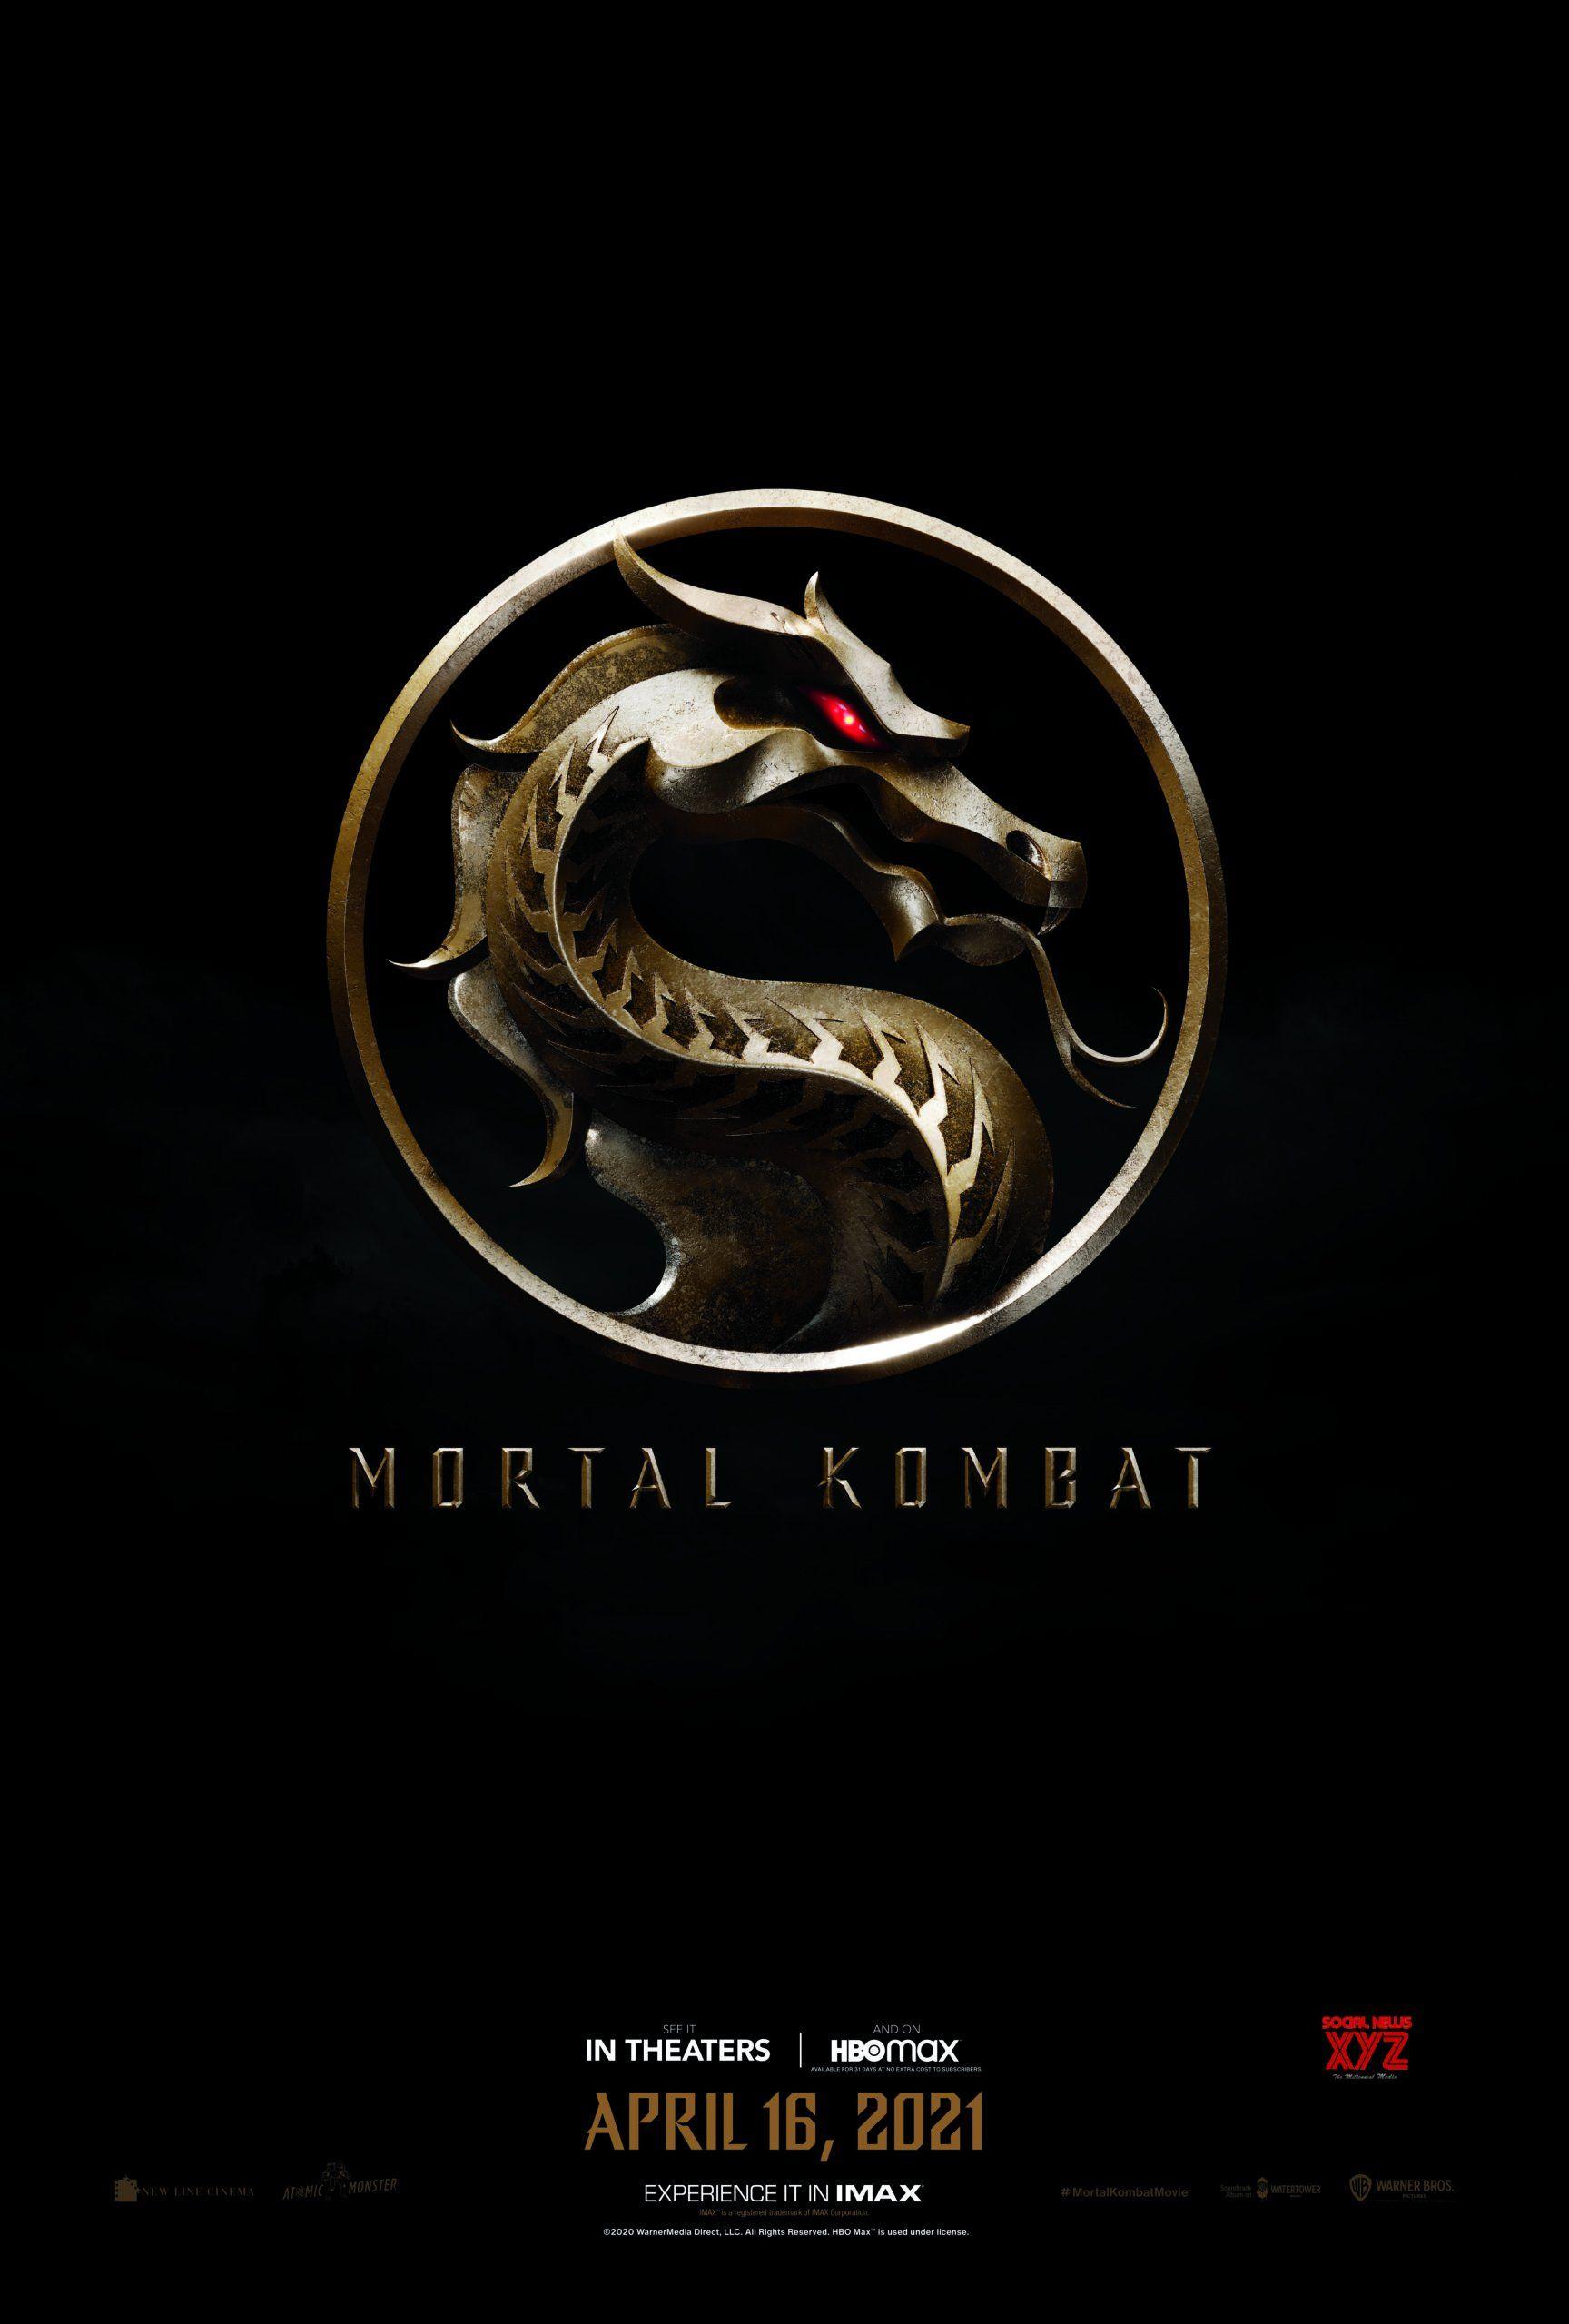 Mortal Kombat Movie Hd Poster Social News Xyz In 2021 Mortal Kombat Movies Movie Nerd